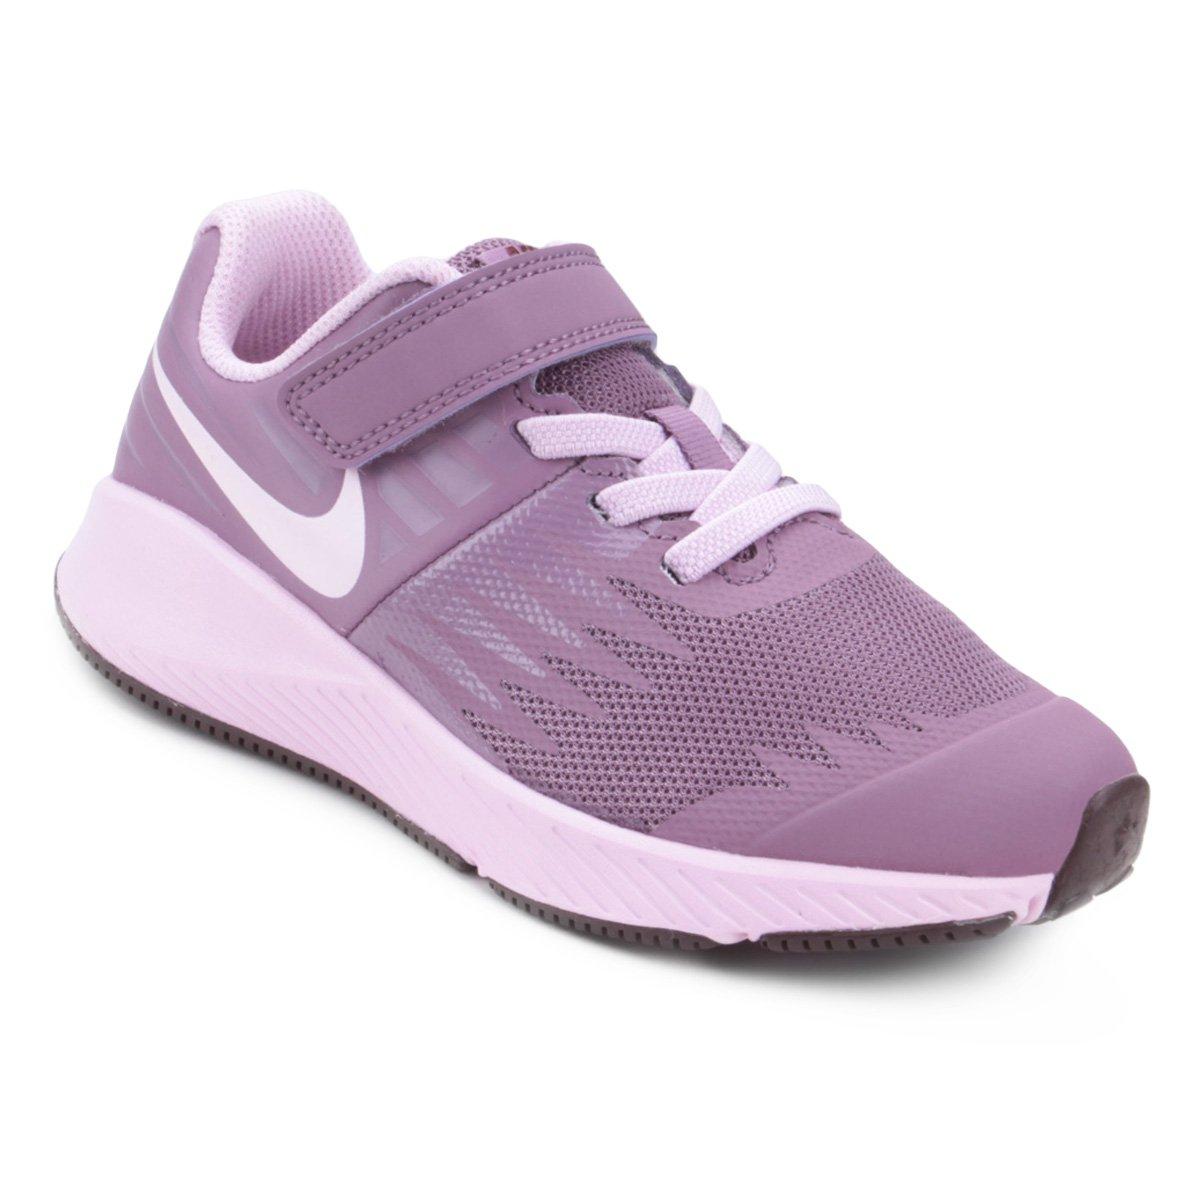 Tênis Infantil Nike Star Runner Feminino - Roxo - Compre Agora ... 73f4f2b5ffa34